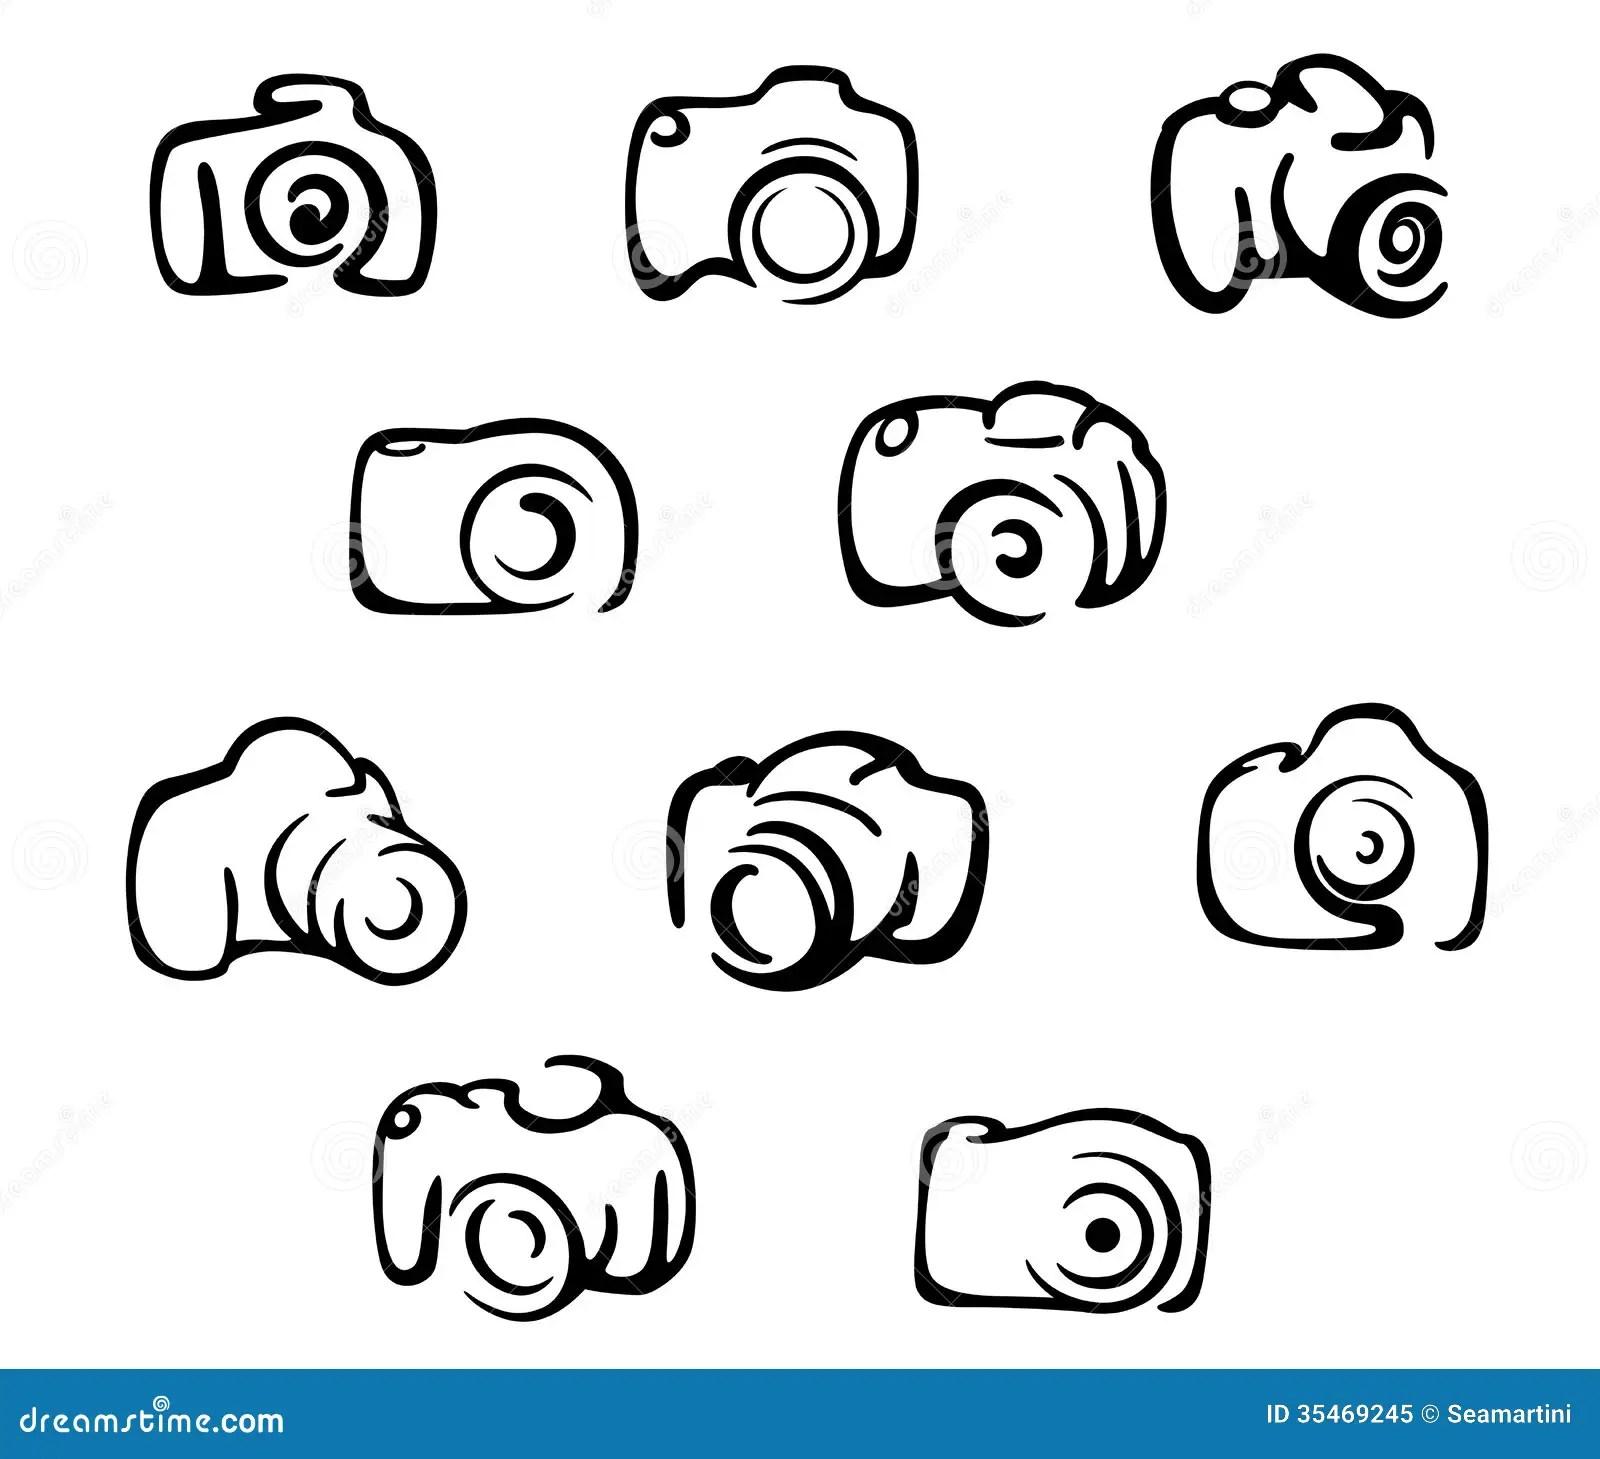 Camera Icons And Symbols Set Royalty Free Stock Photo